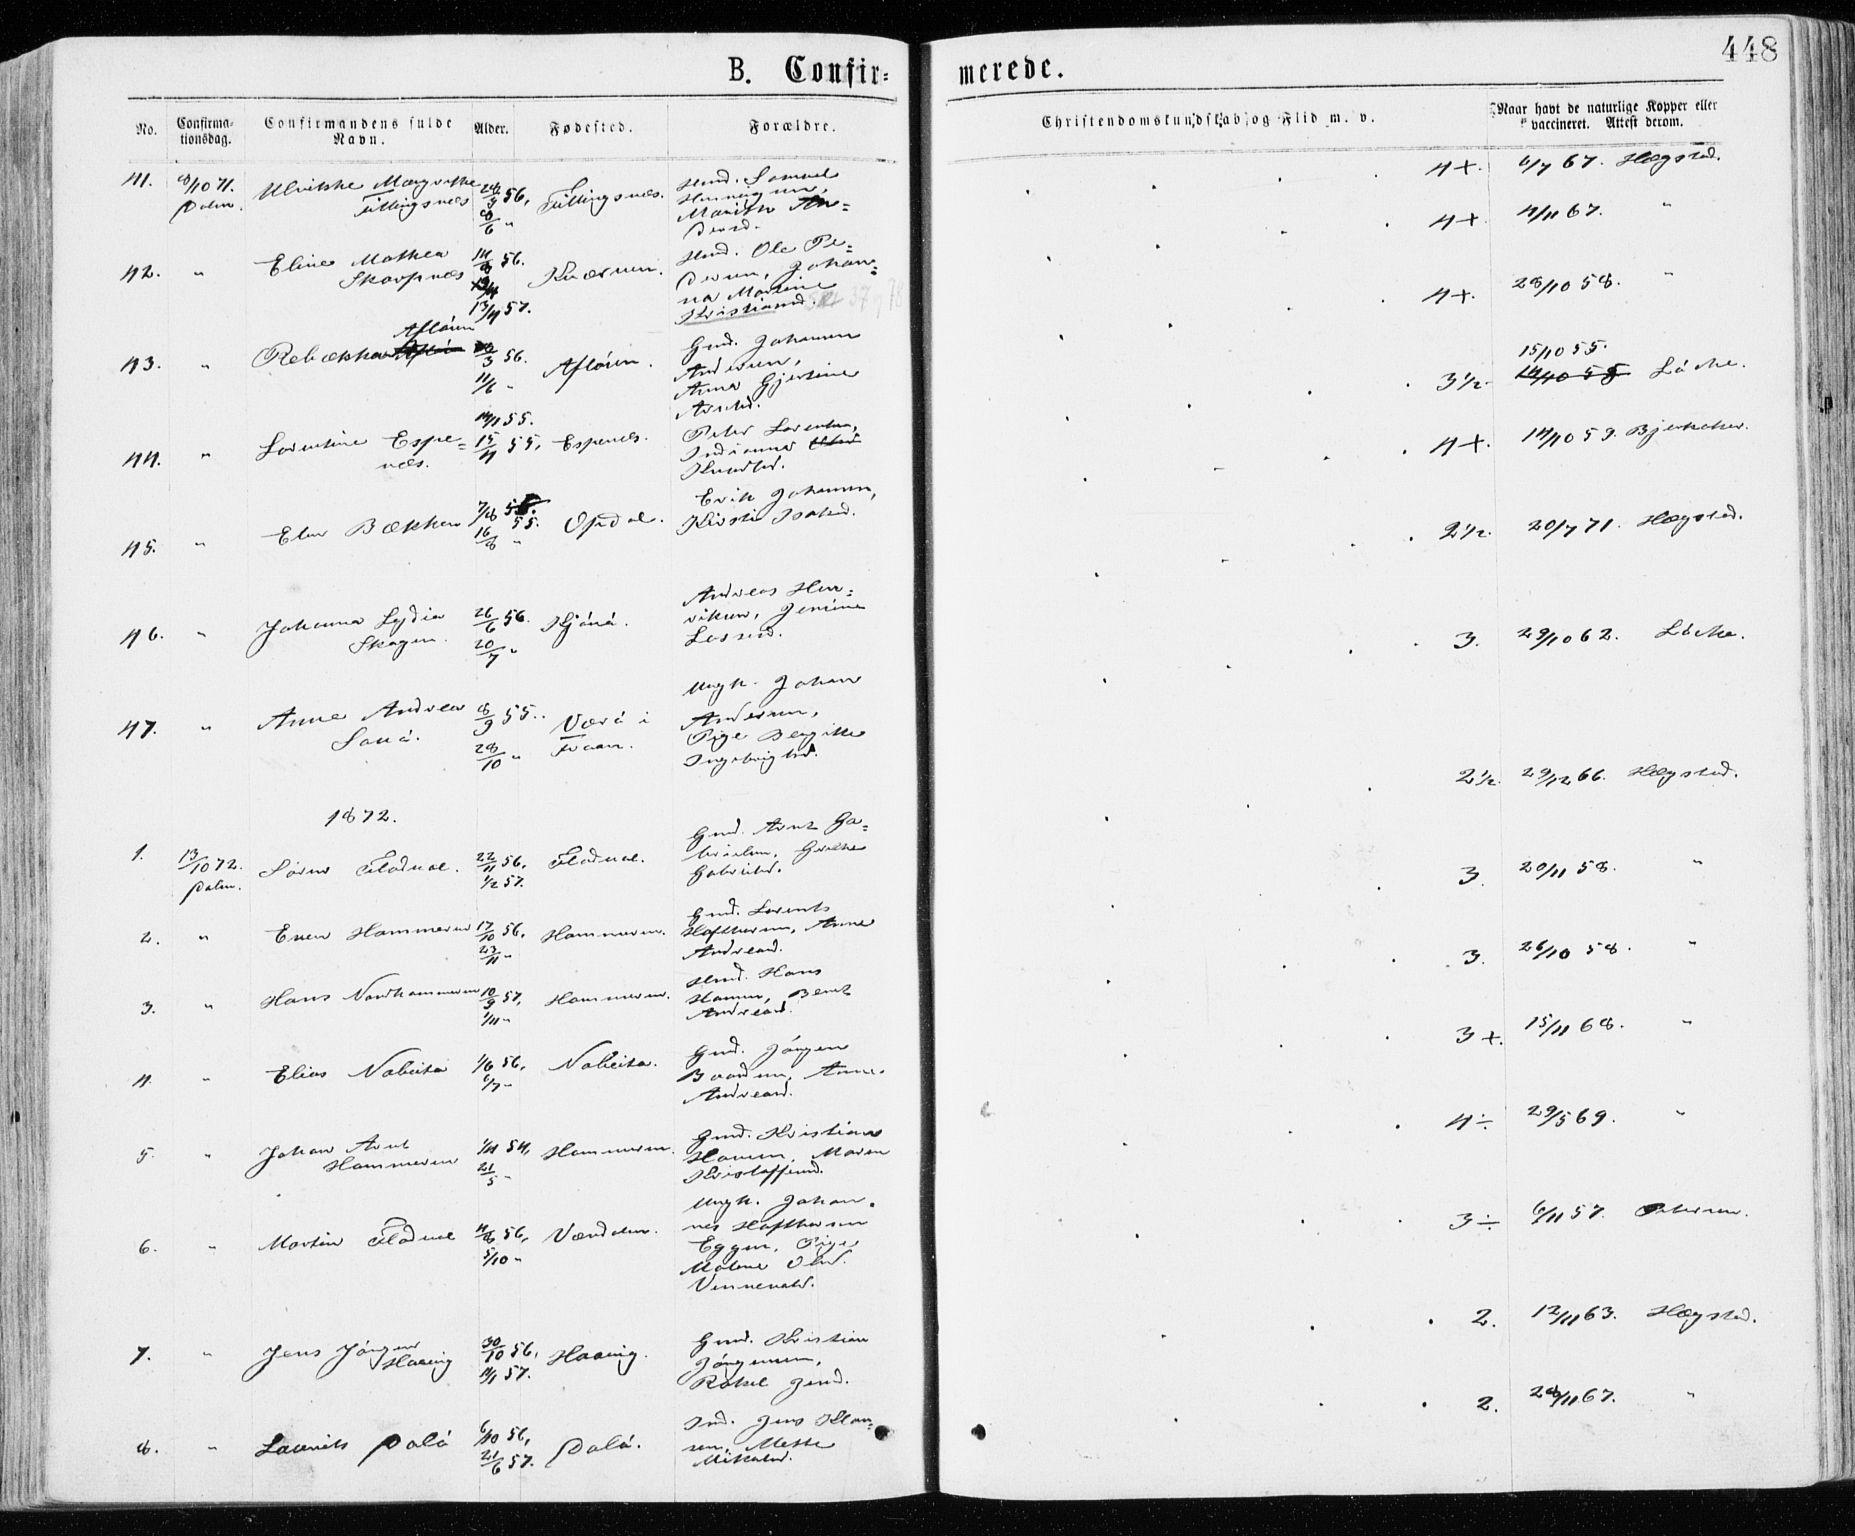 SAT, Ministerialprotokoller, klokkerbøker og fødselsregistre - Sør-Trøndelag, 640/L0576: Parish register (official) no. 640A01, 1846-1876, p. 448